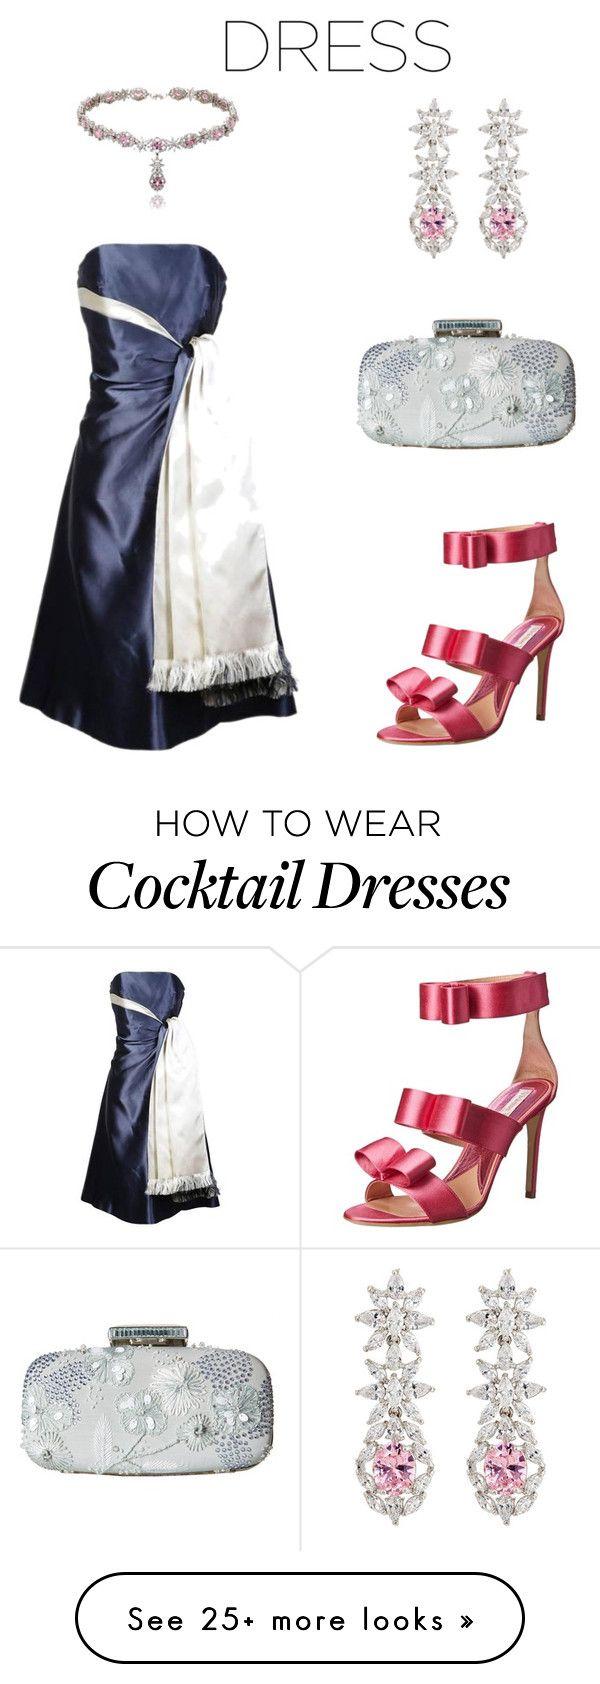 """Lanvin Two-Toned Silk Satin Cocktail Dress"" by simpleelegance-558 on Polyvore featuring Lanvin, Oscar de la Renta, Vivienne Westwood and Fallon"